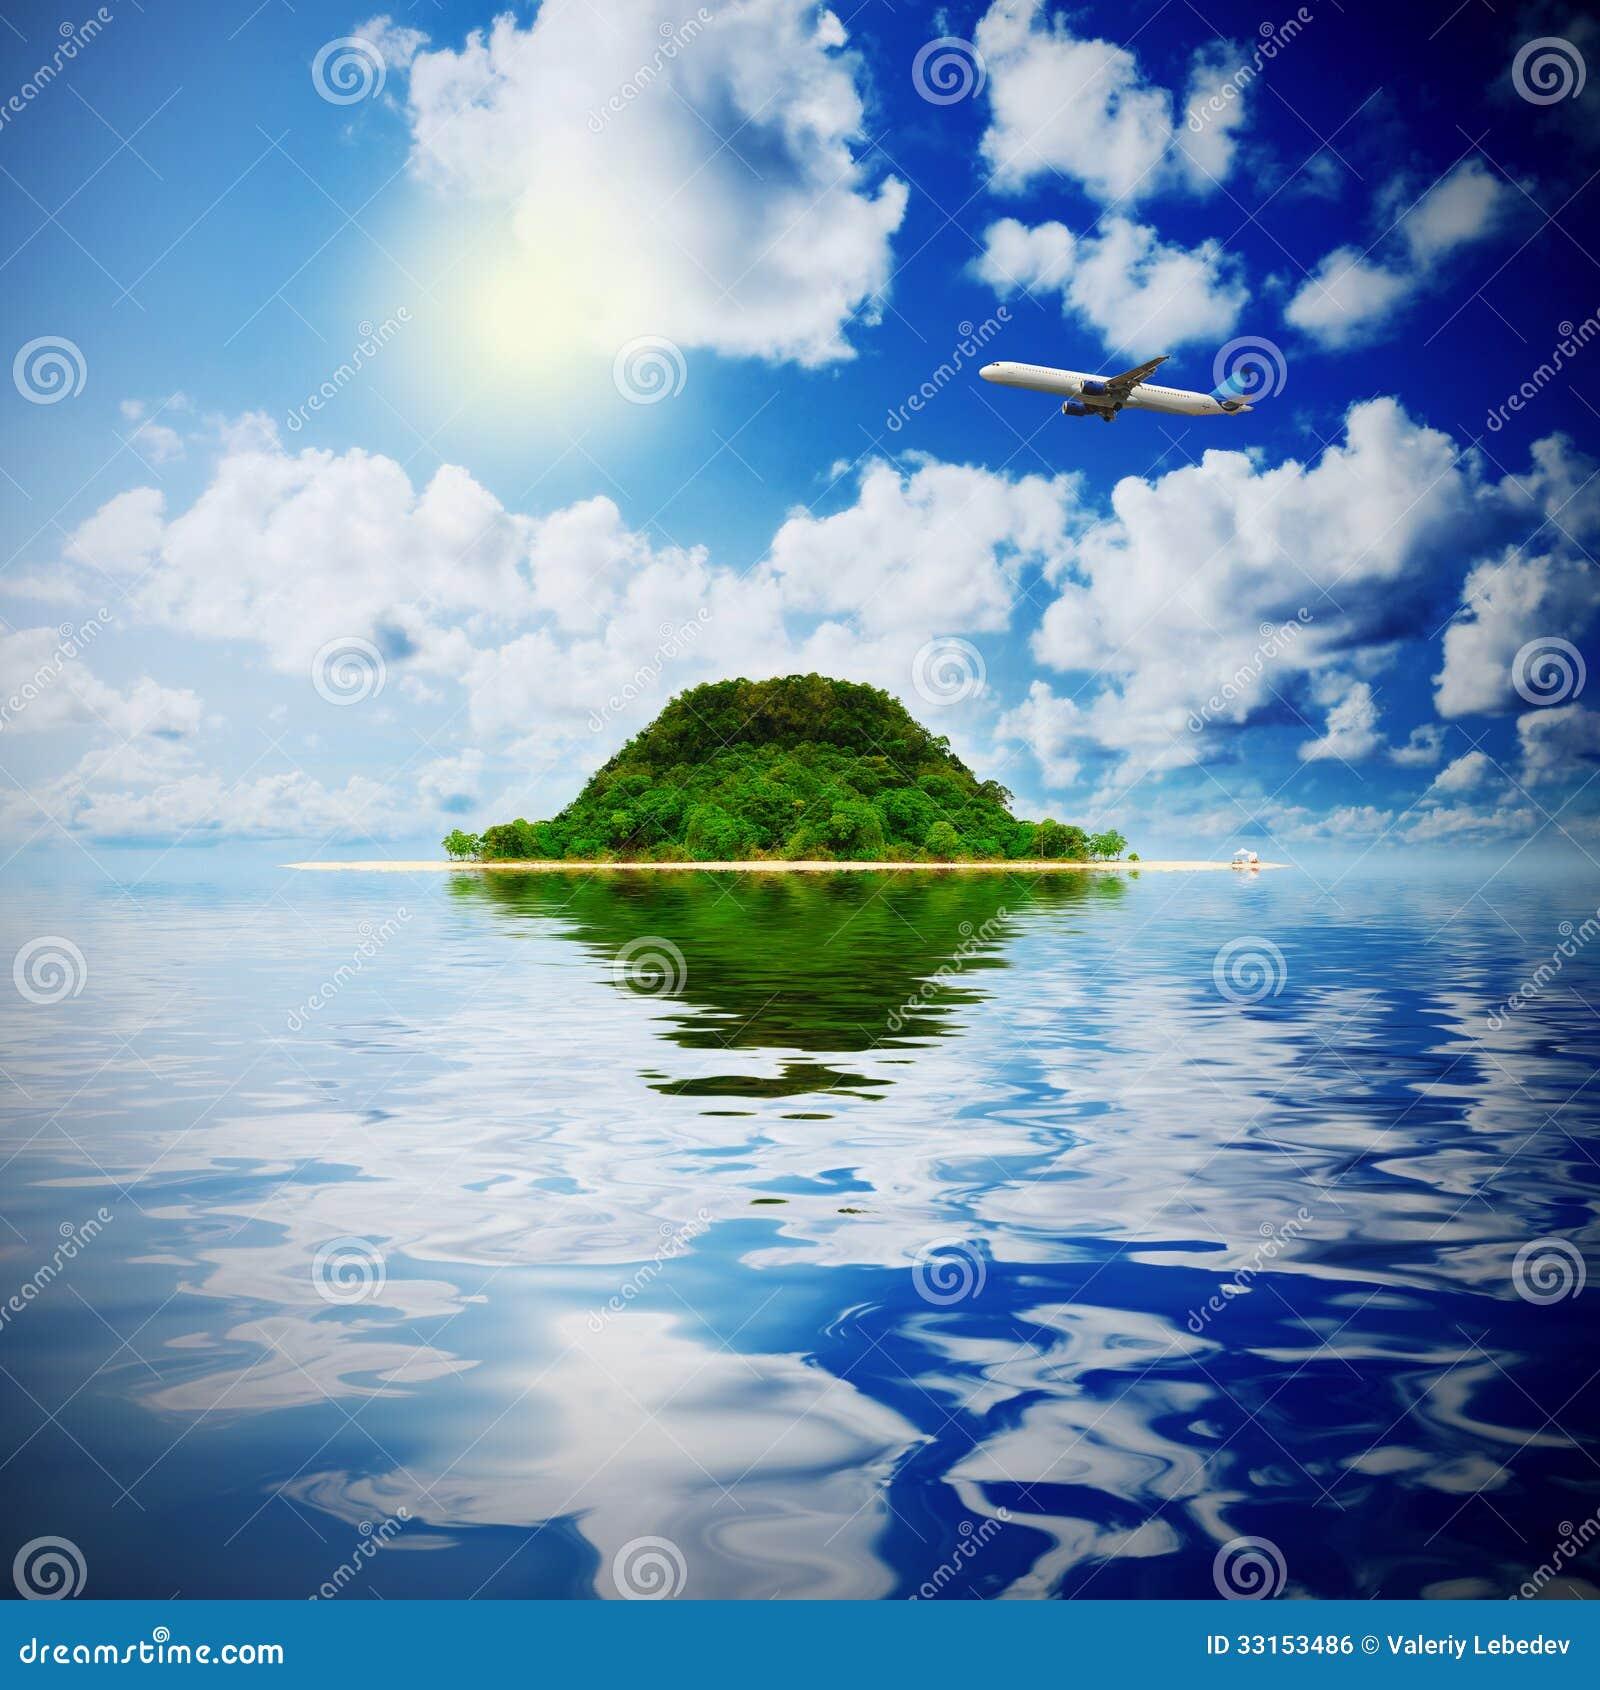 Tropical Island Paradise: Sunny Tropical Beach On The Island Royalty Free Stock